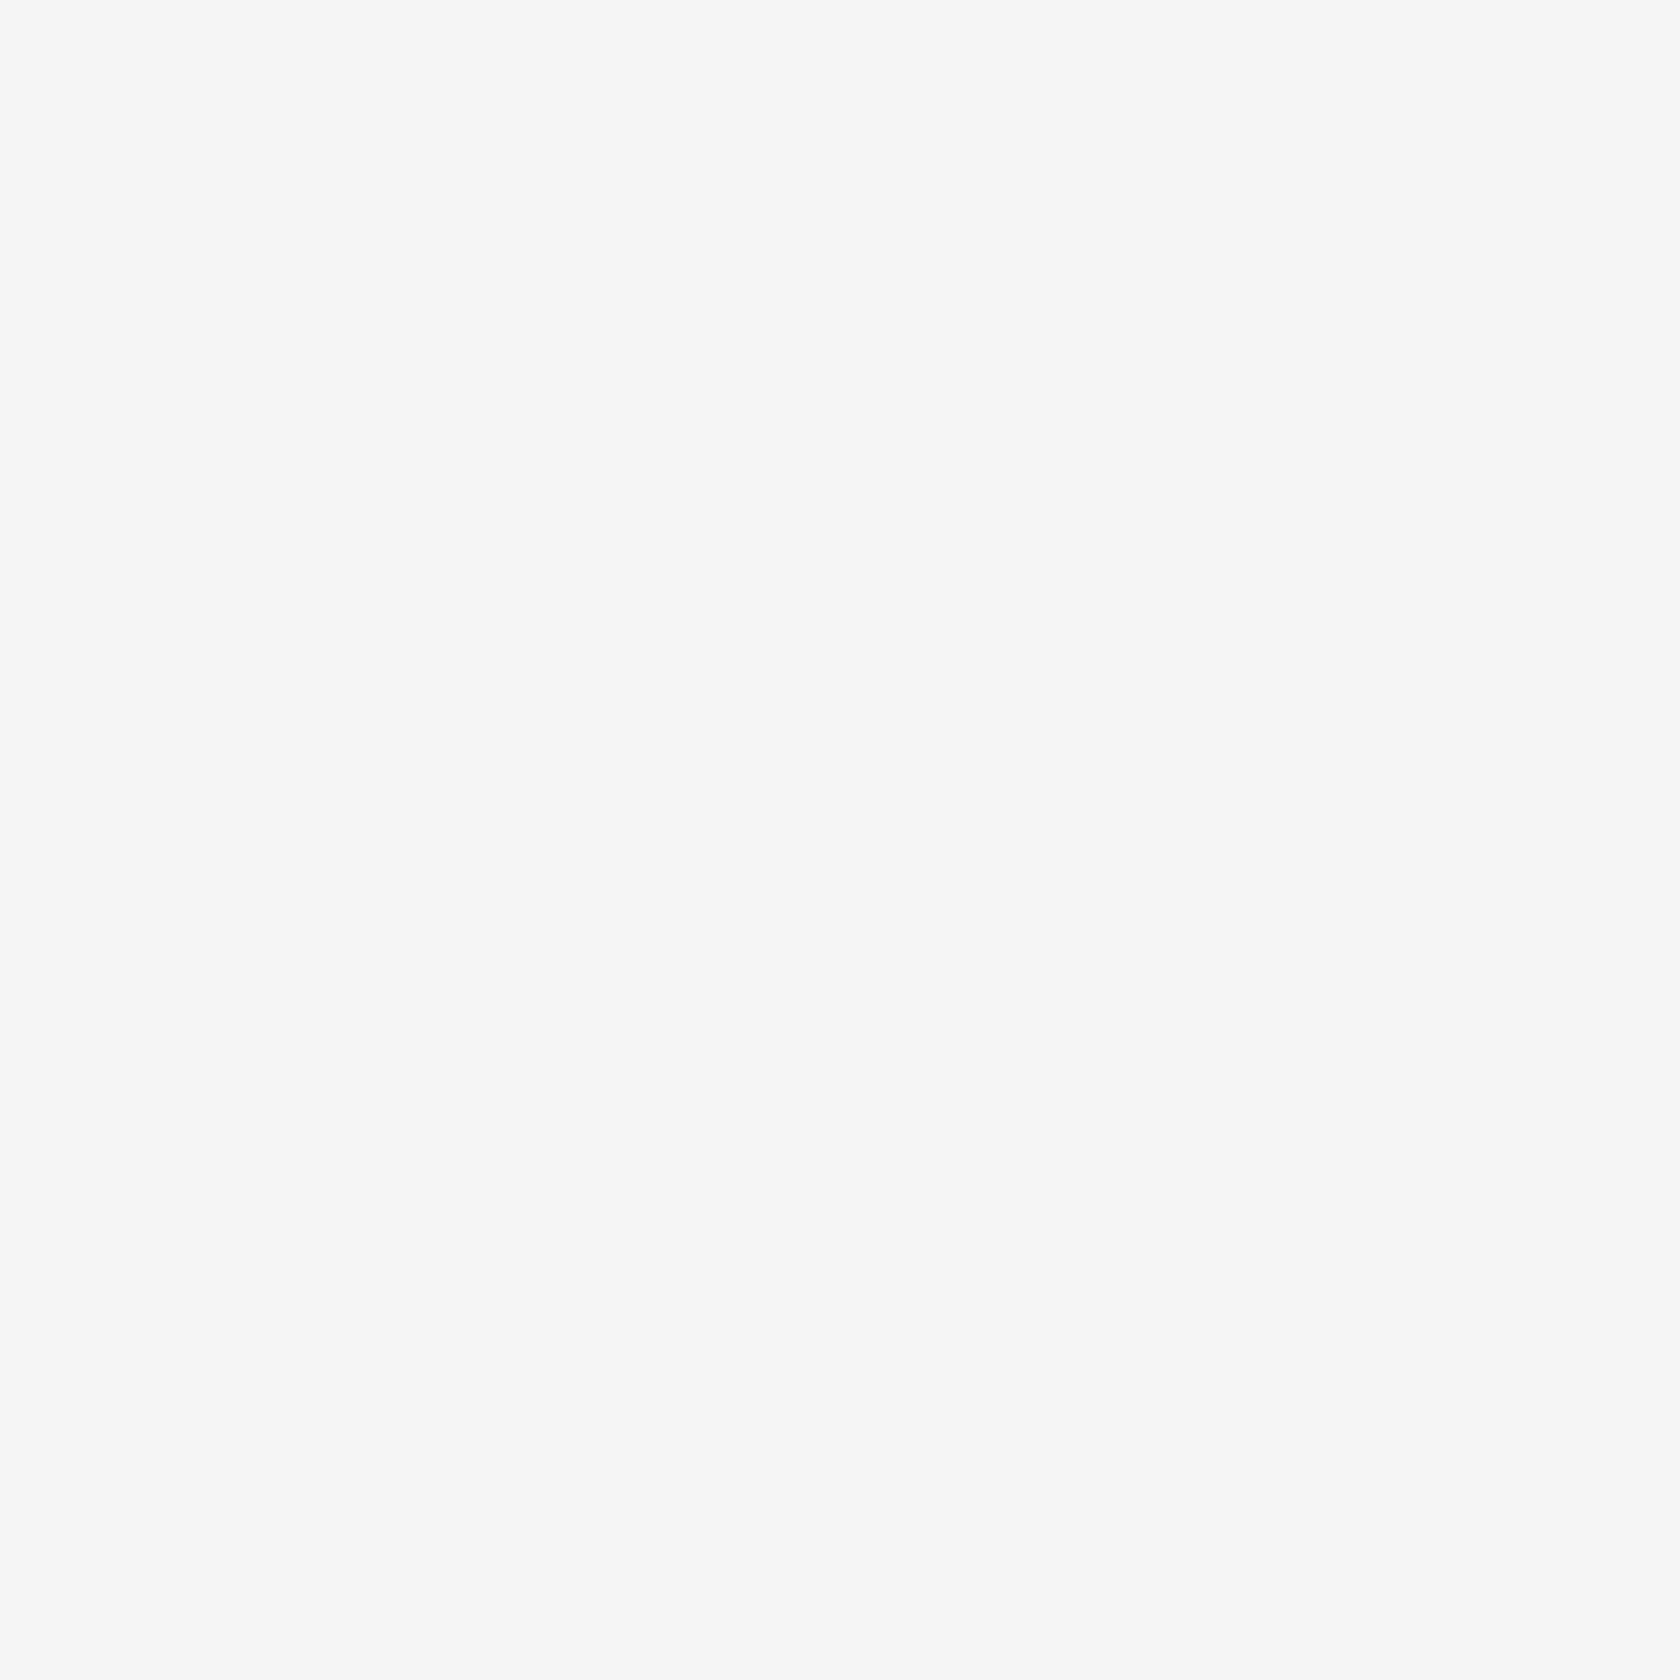 Bearn wallet  5625cd64dadc7